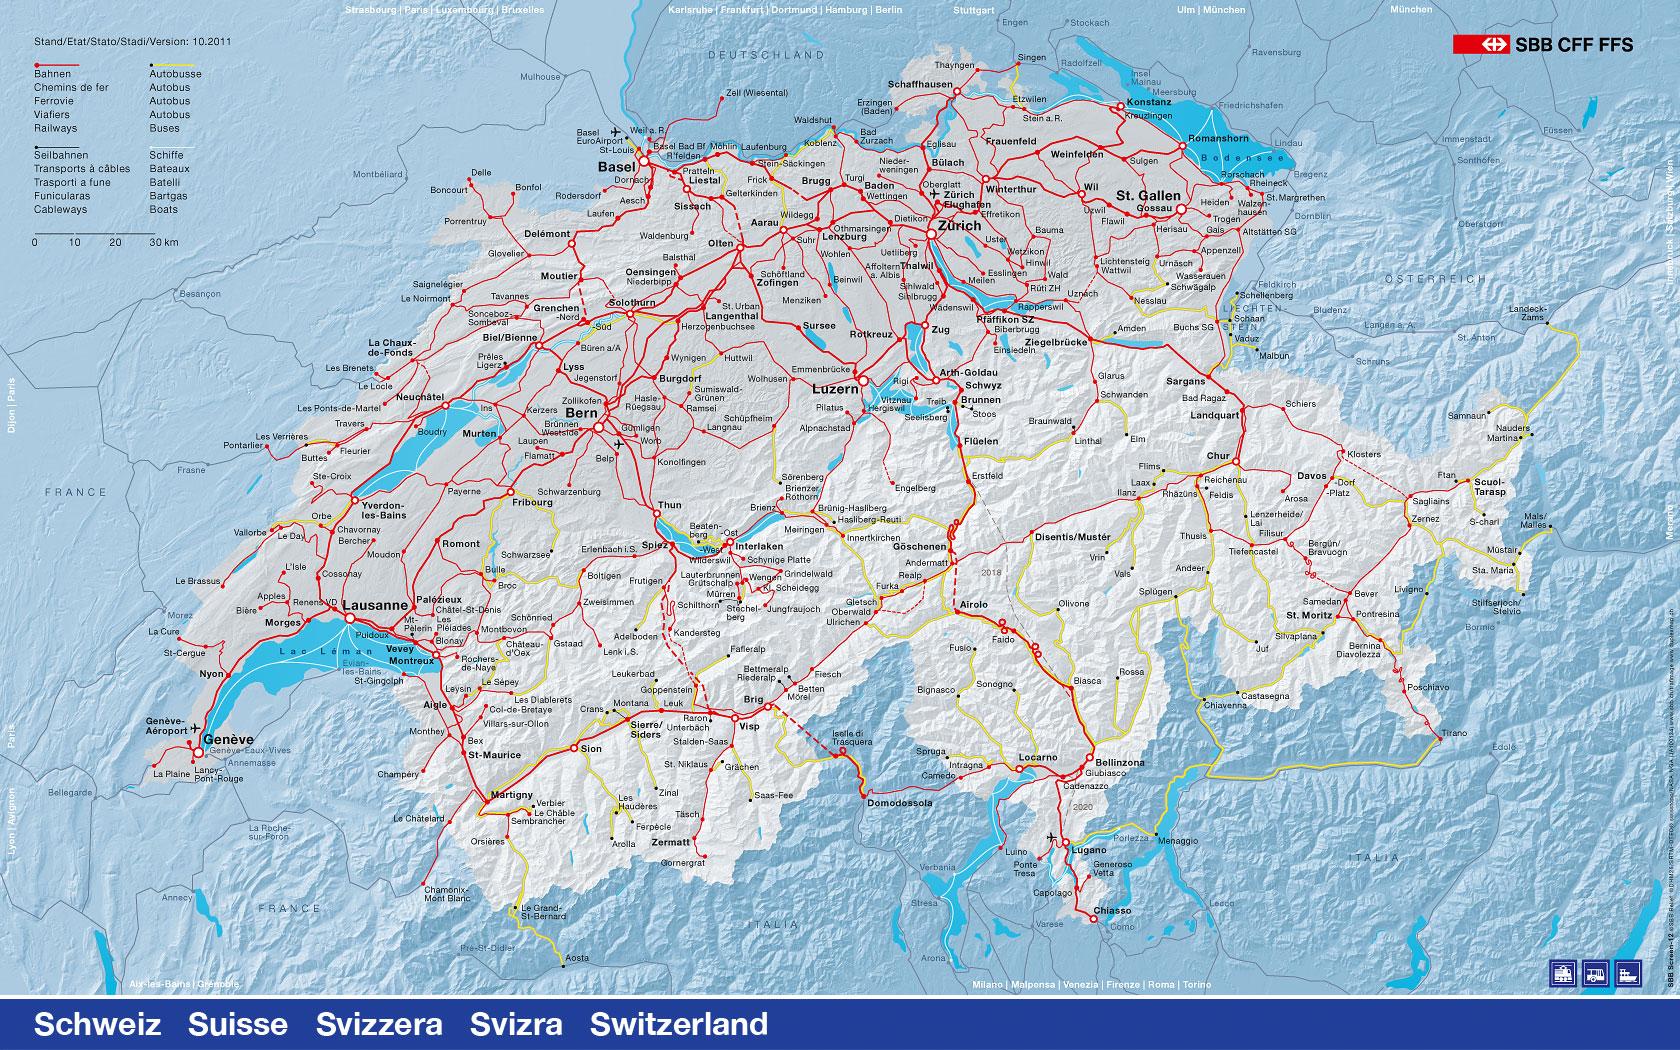 Sbb Schweiz Karte | Kleve Landkarte